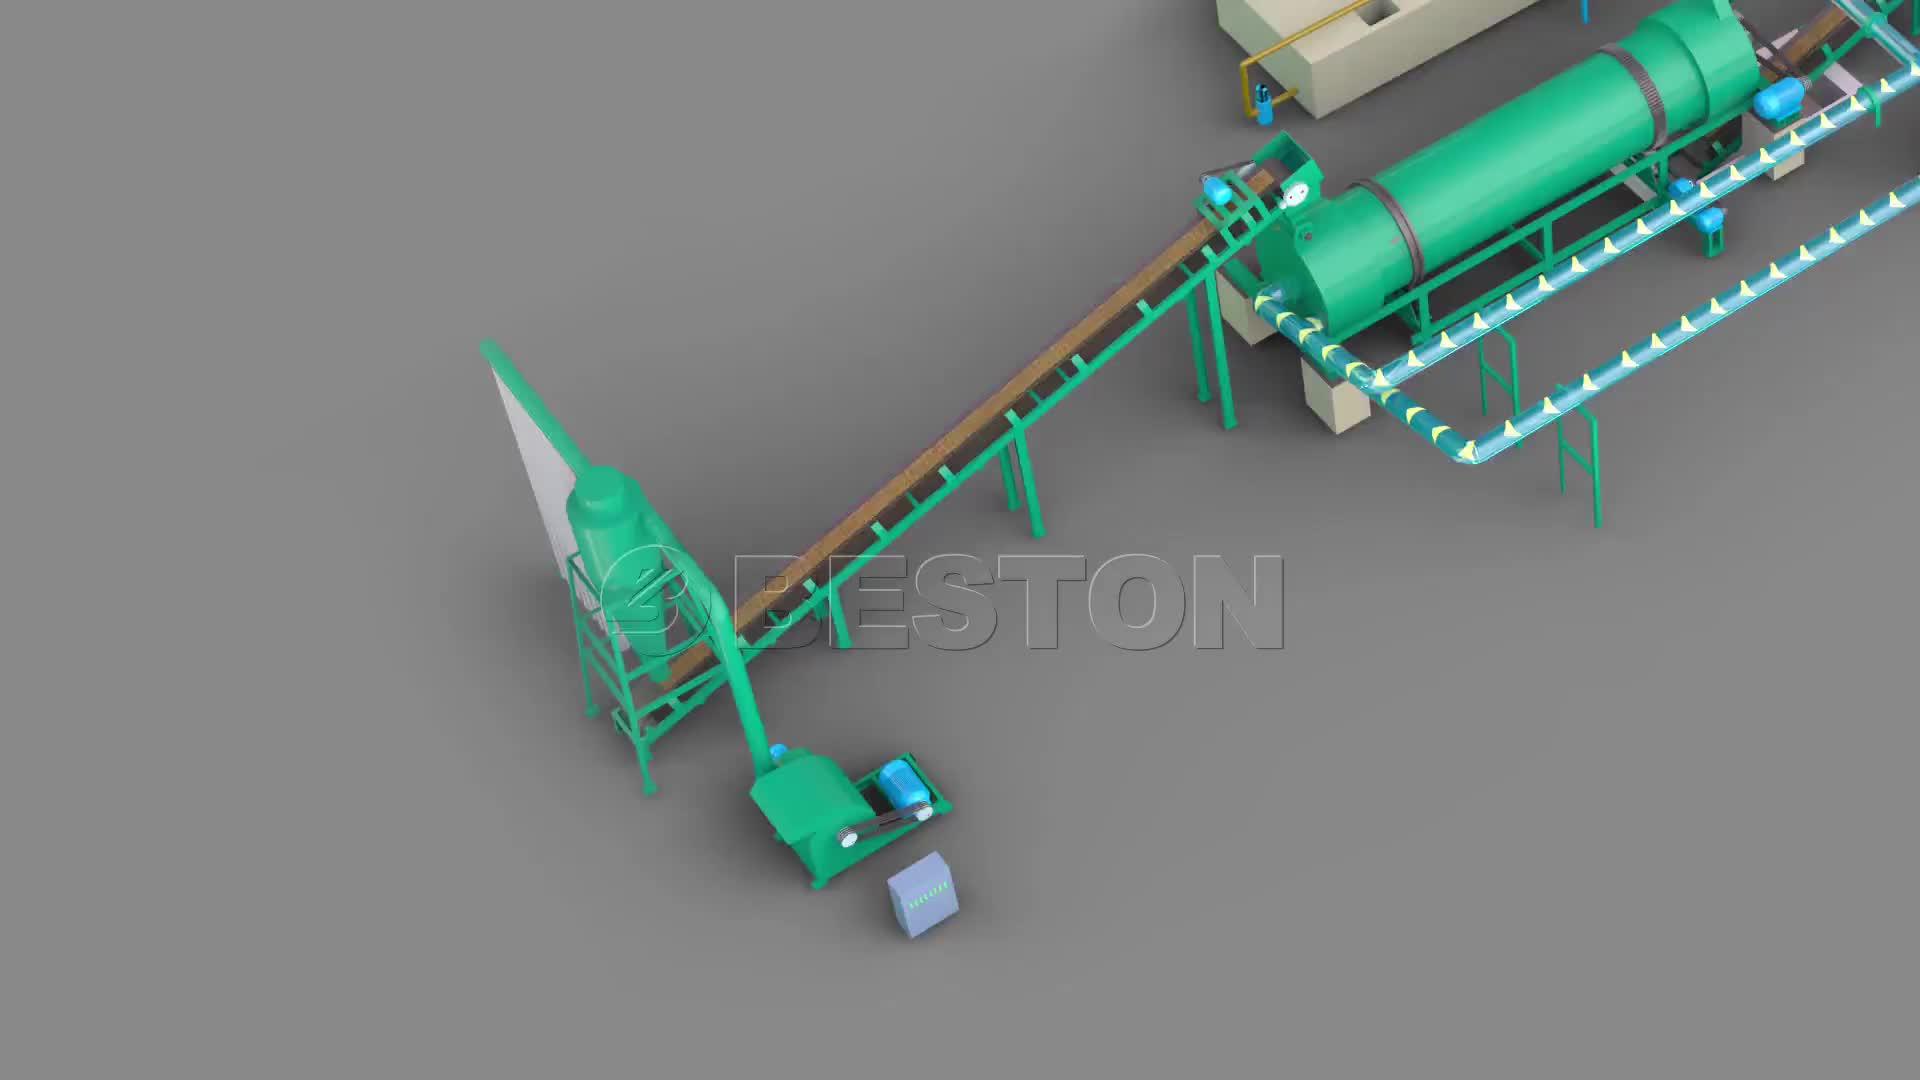 Kokosnoot houtskool making machine prijs te koop